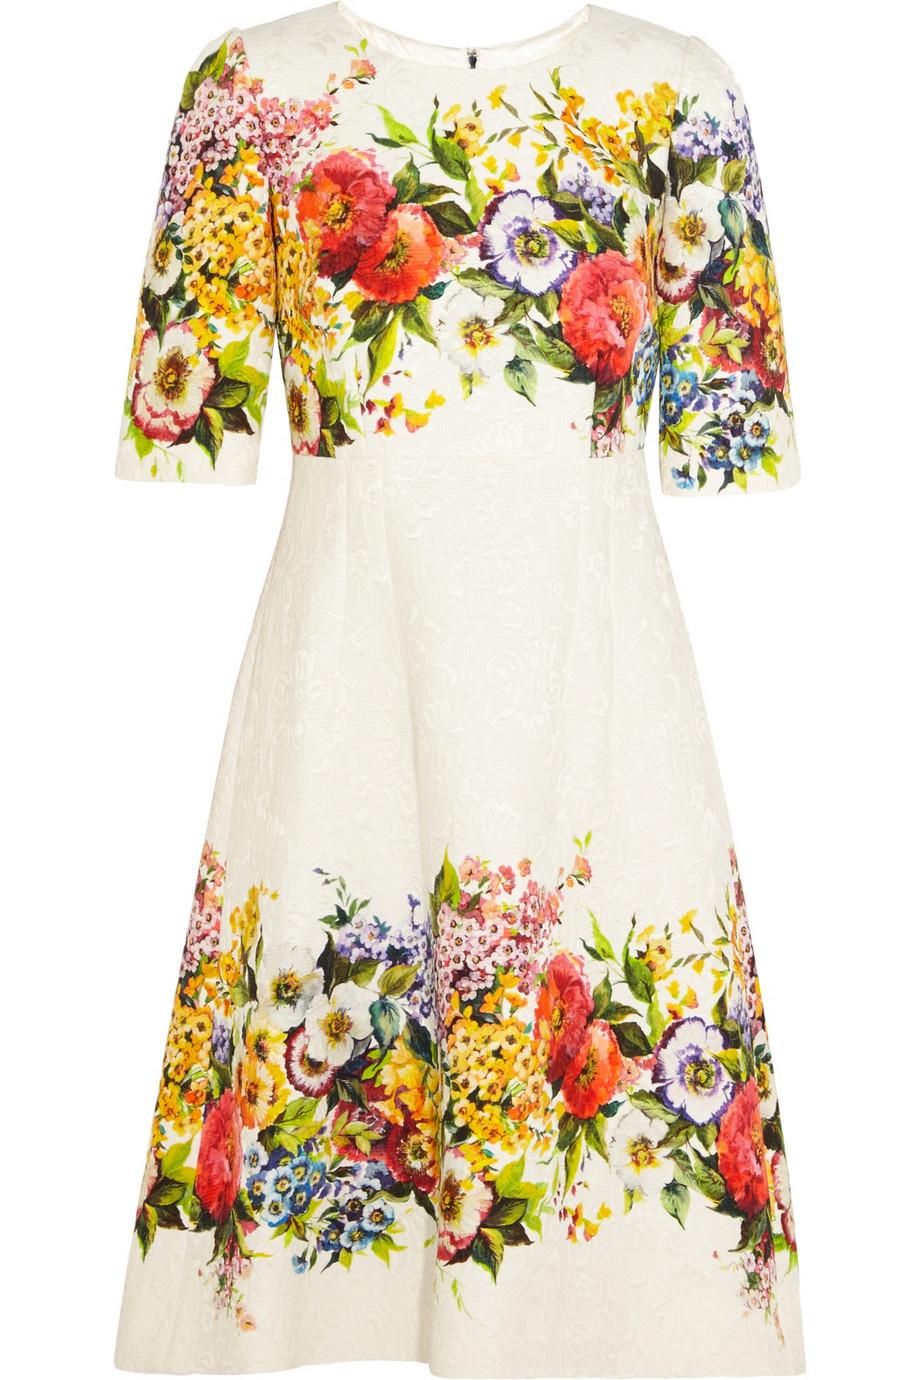 Lyst - Dolce & Gabbana Floral-Brocade Dress in White